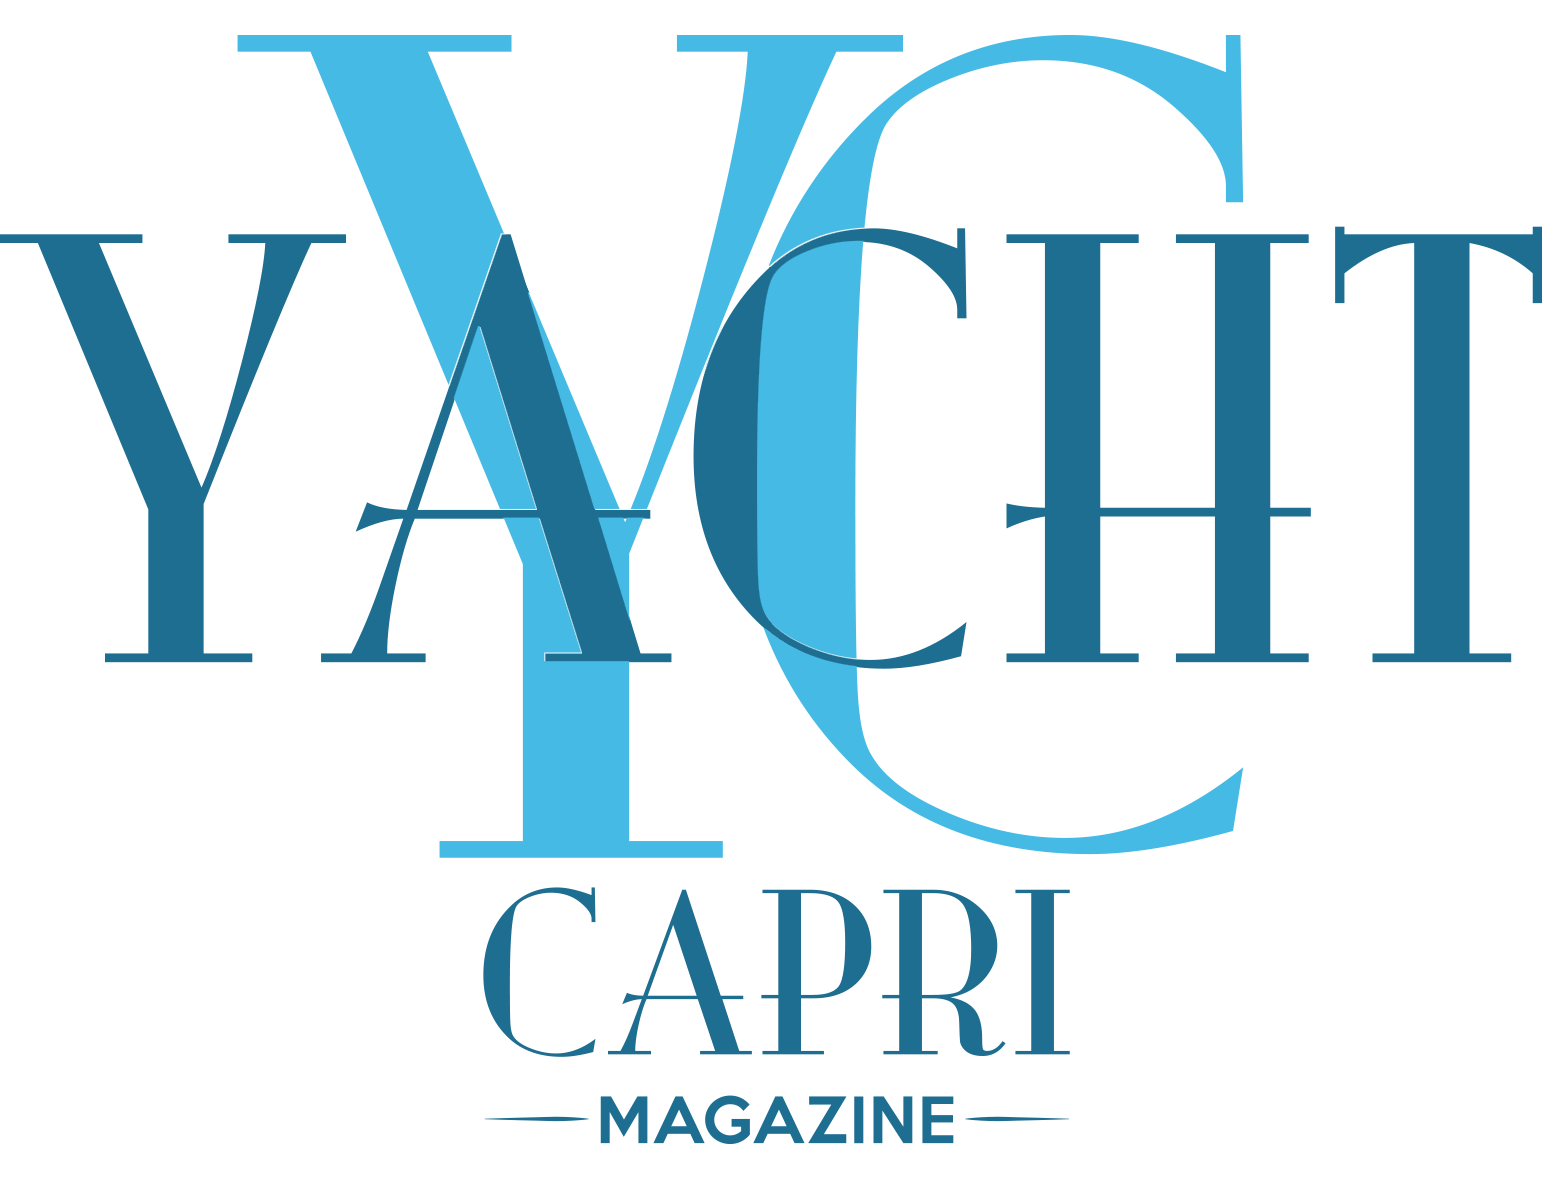 Yacht Capri